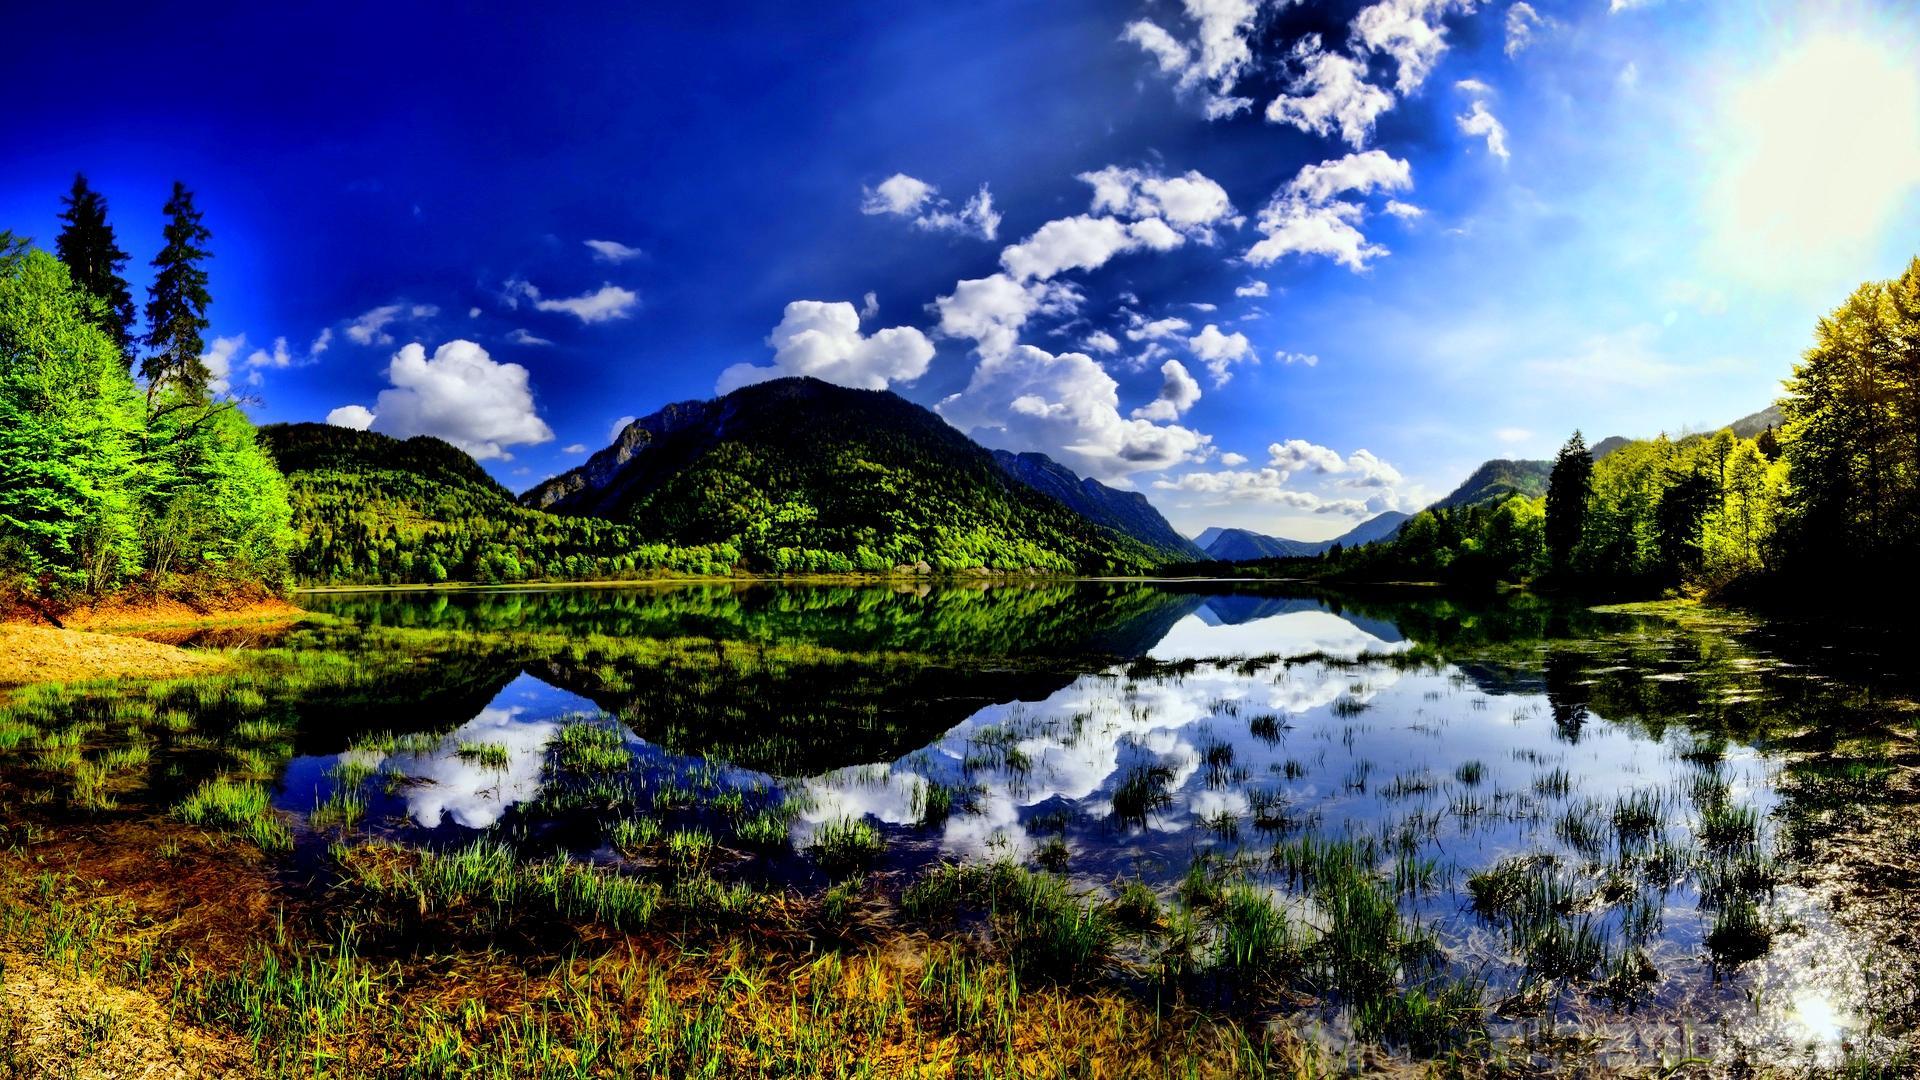 Lake Mountain Reflection Minimalism Wallpapers Hd: Lake Reflections Wallpapers